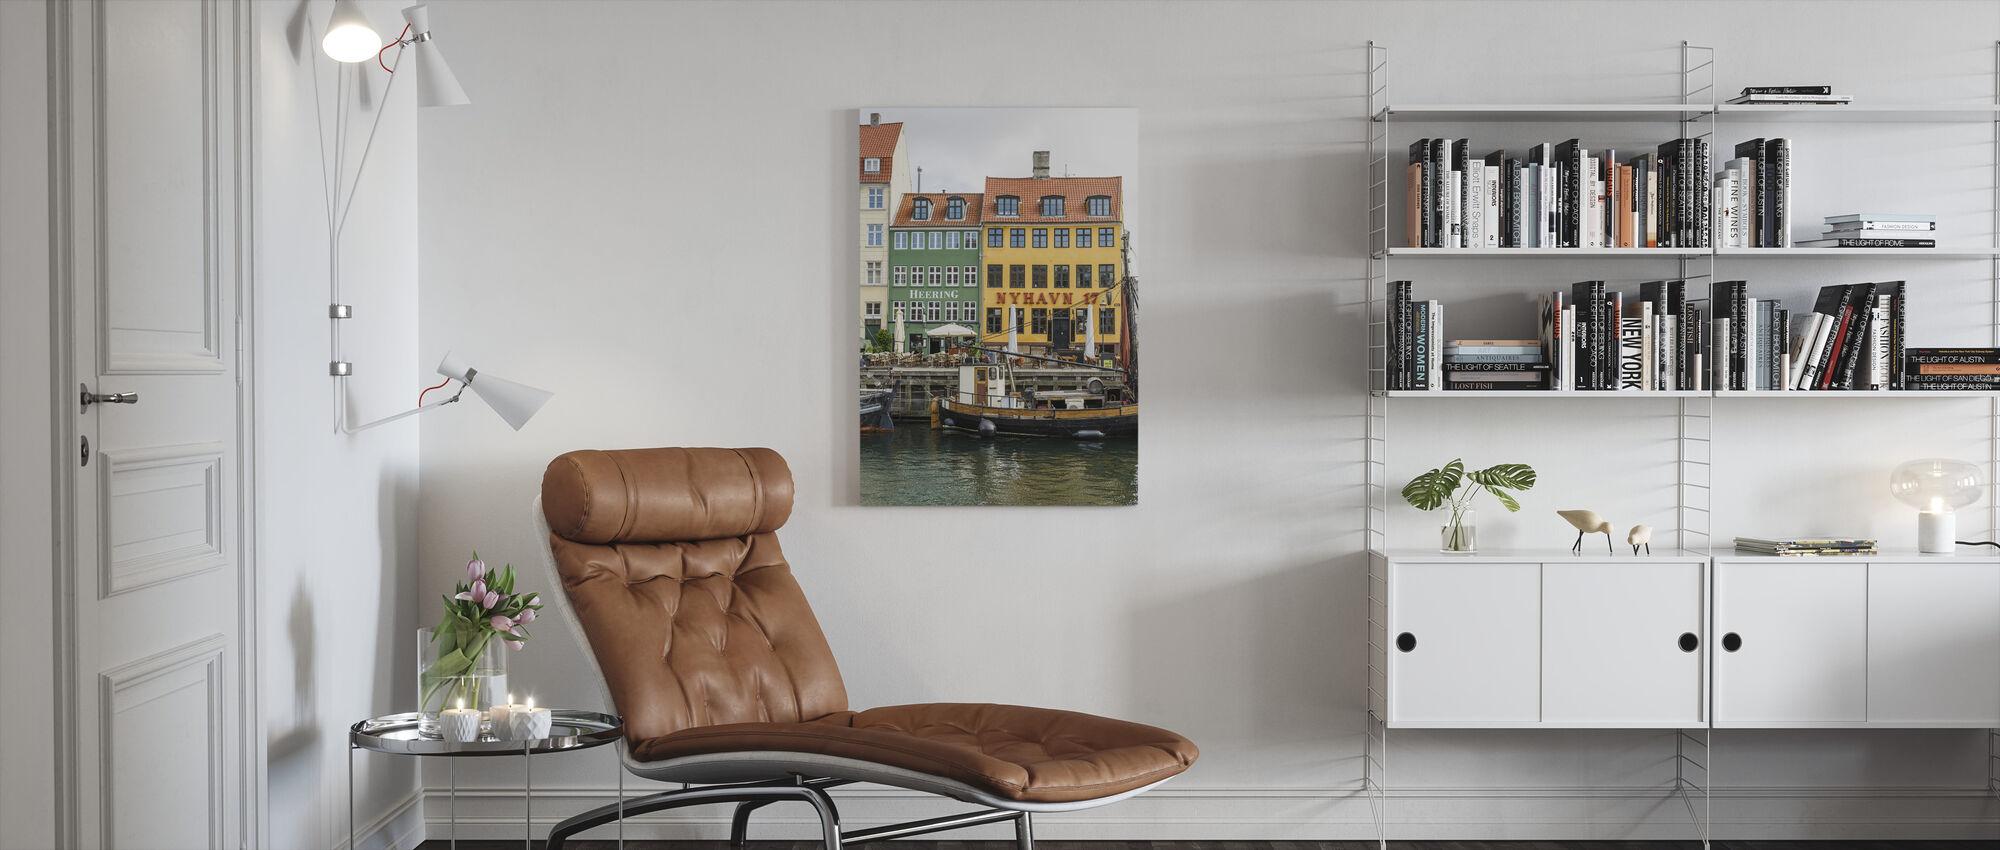 Nyhavn 17, København, Danmark - Lerretsbilde - Stue